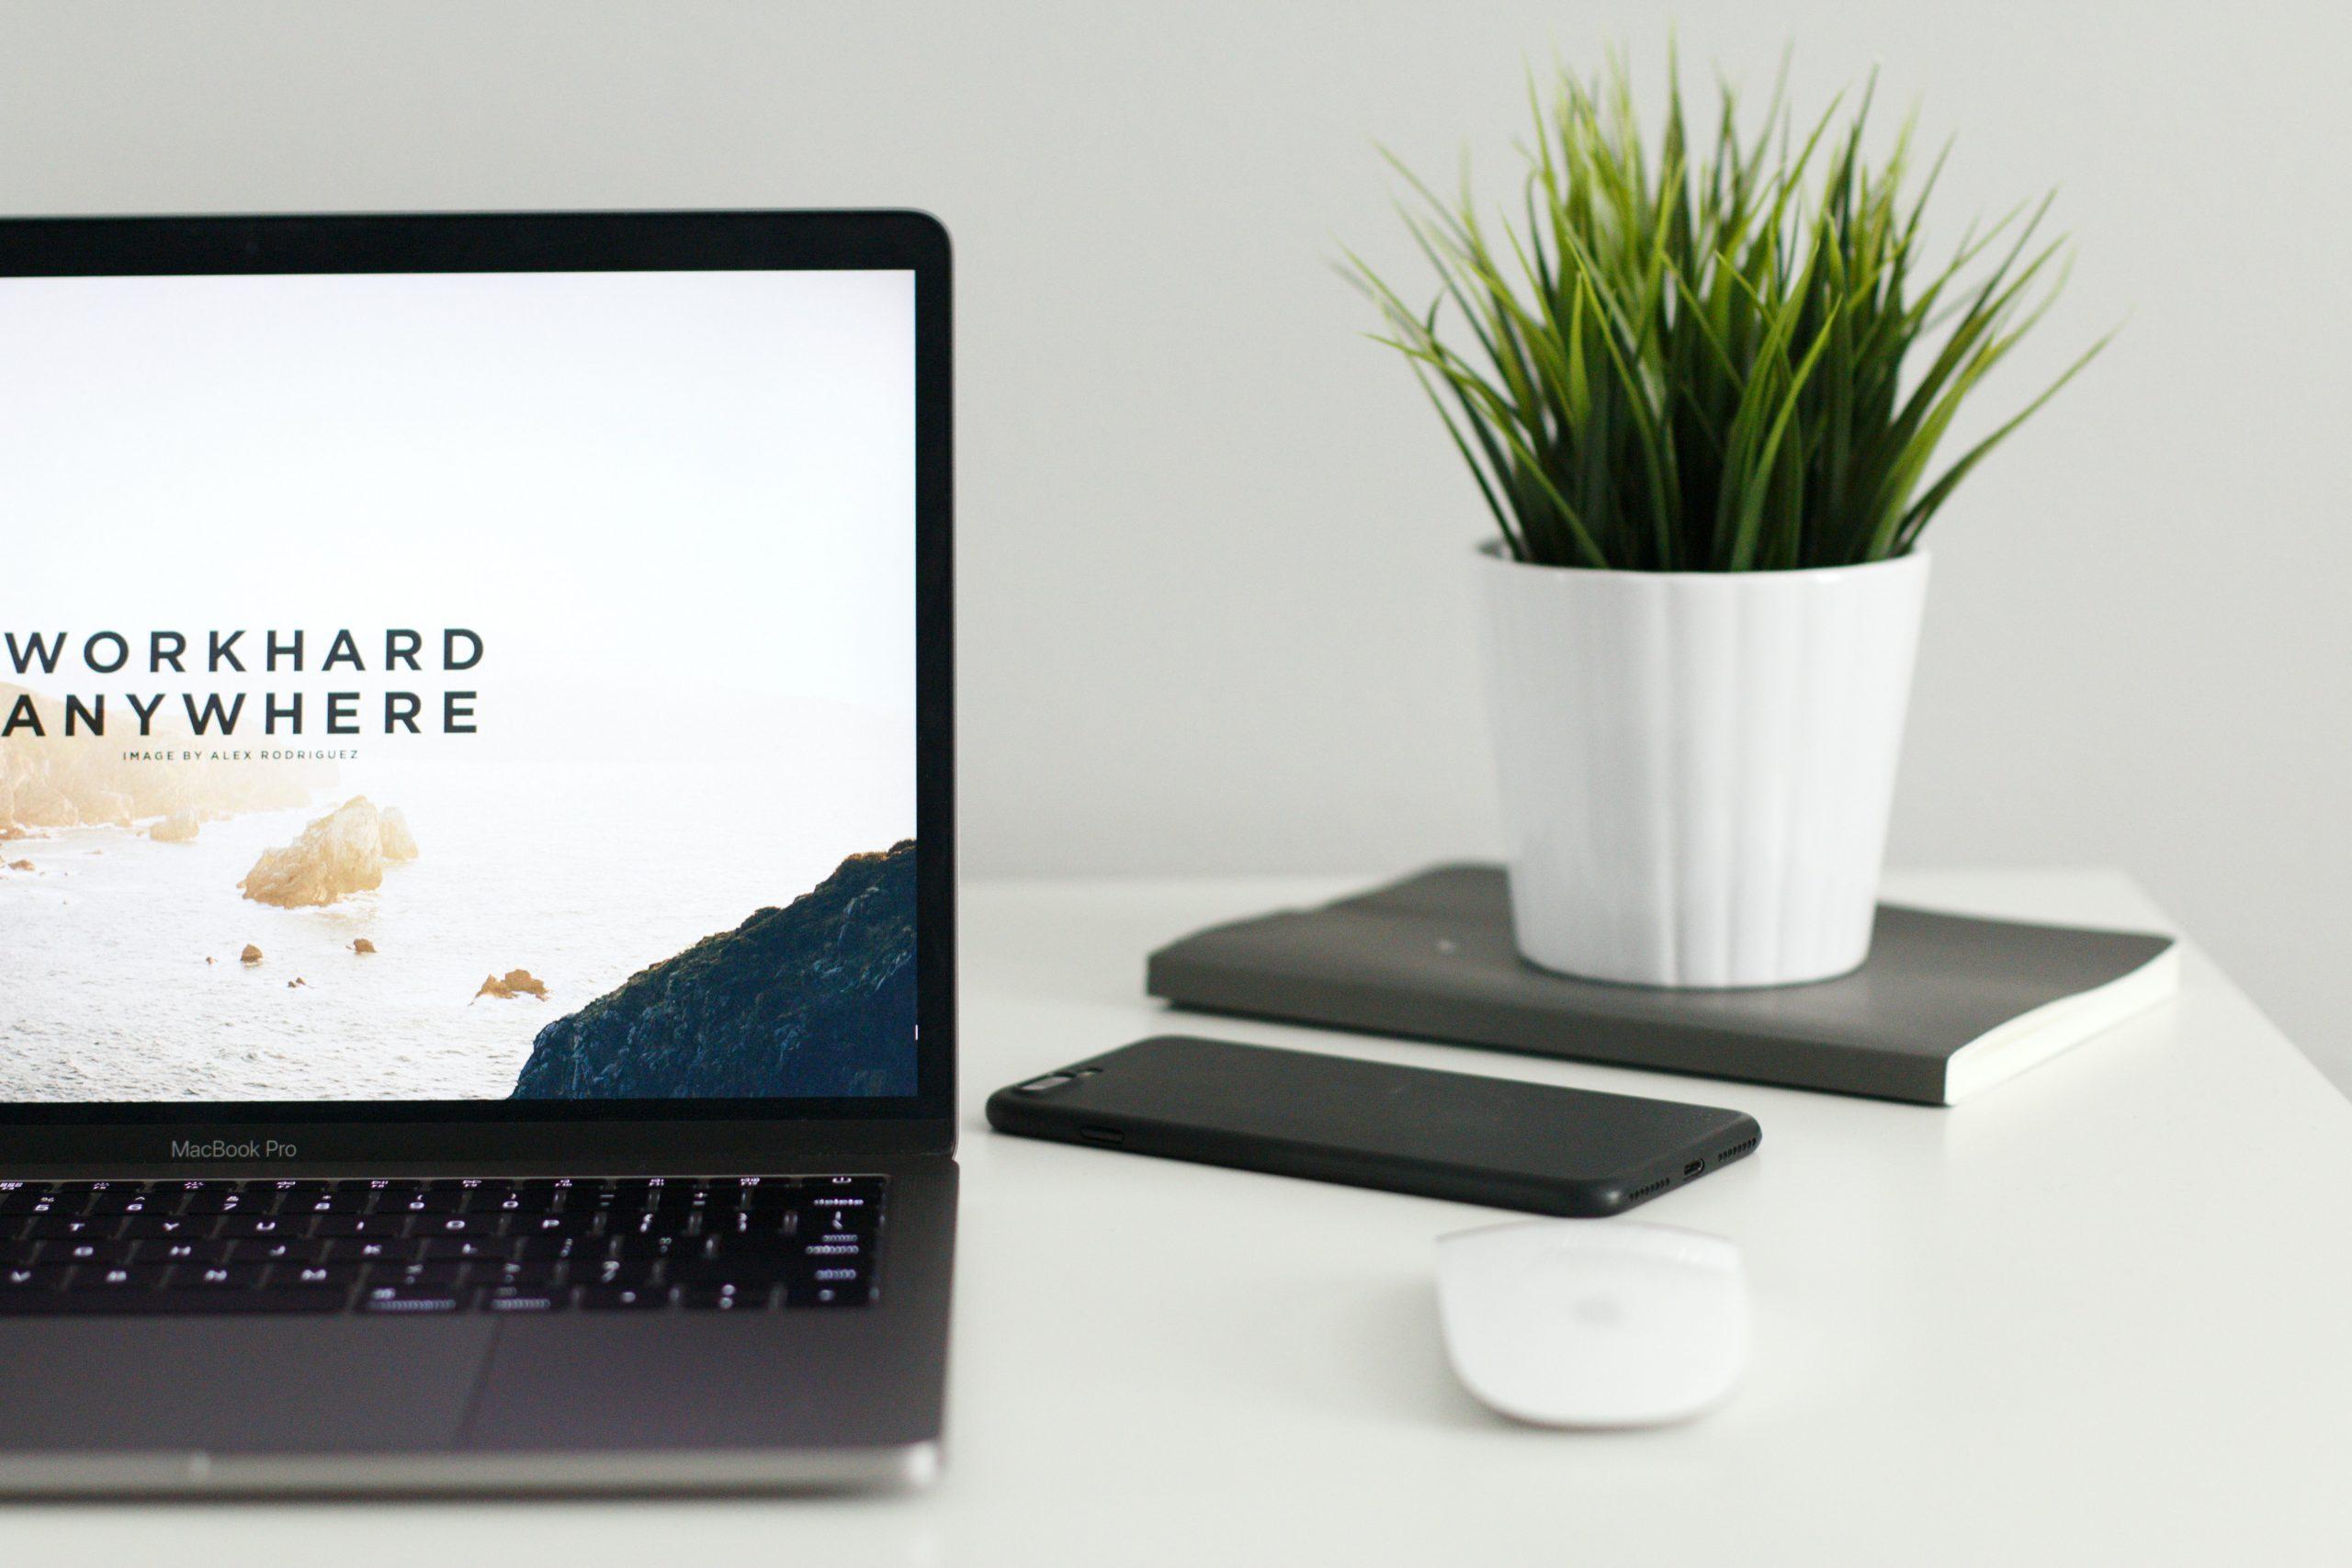 Web Page/ Apps Development